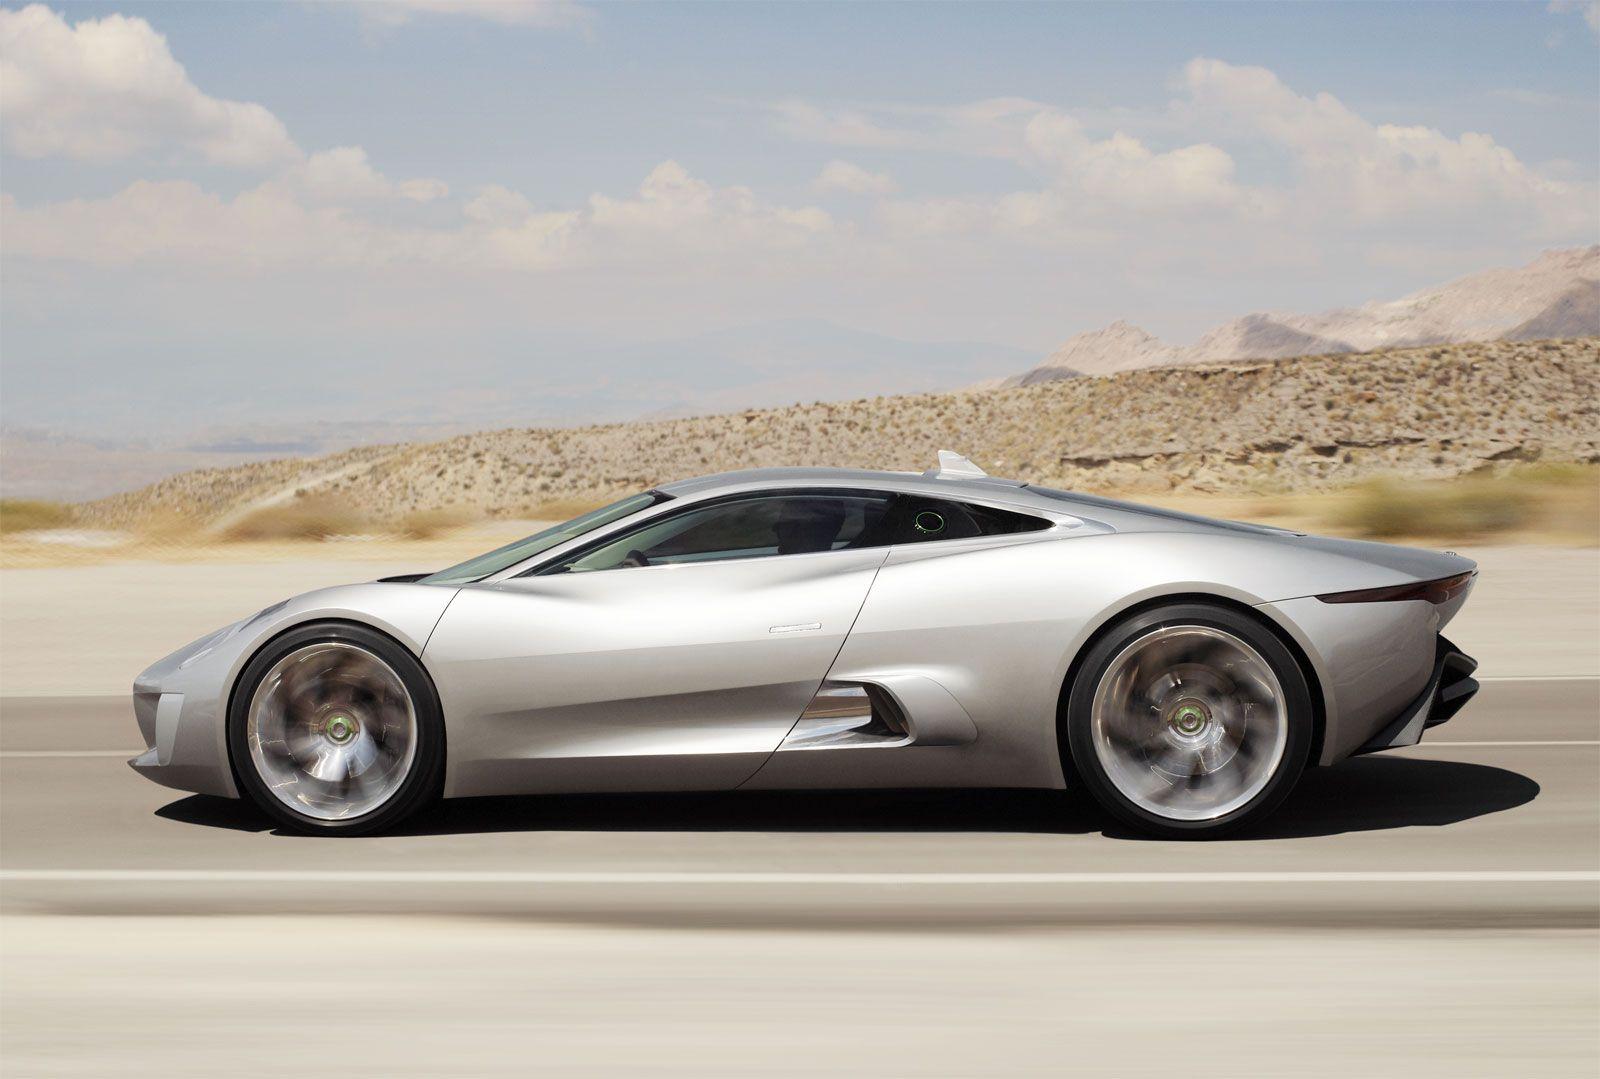 2010 jaguar c x75 concept exotic sports carssuper carprojectsconcept